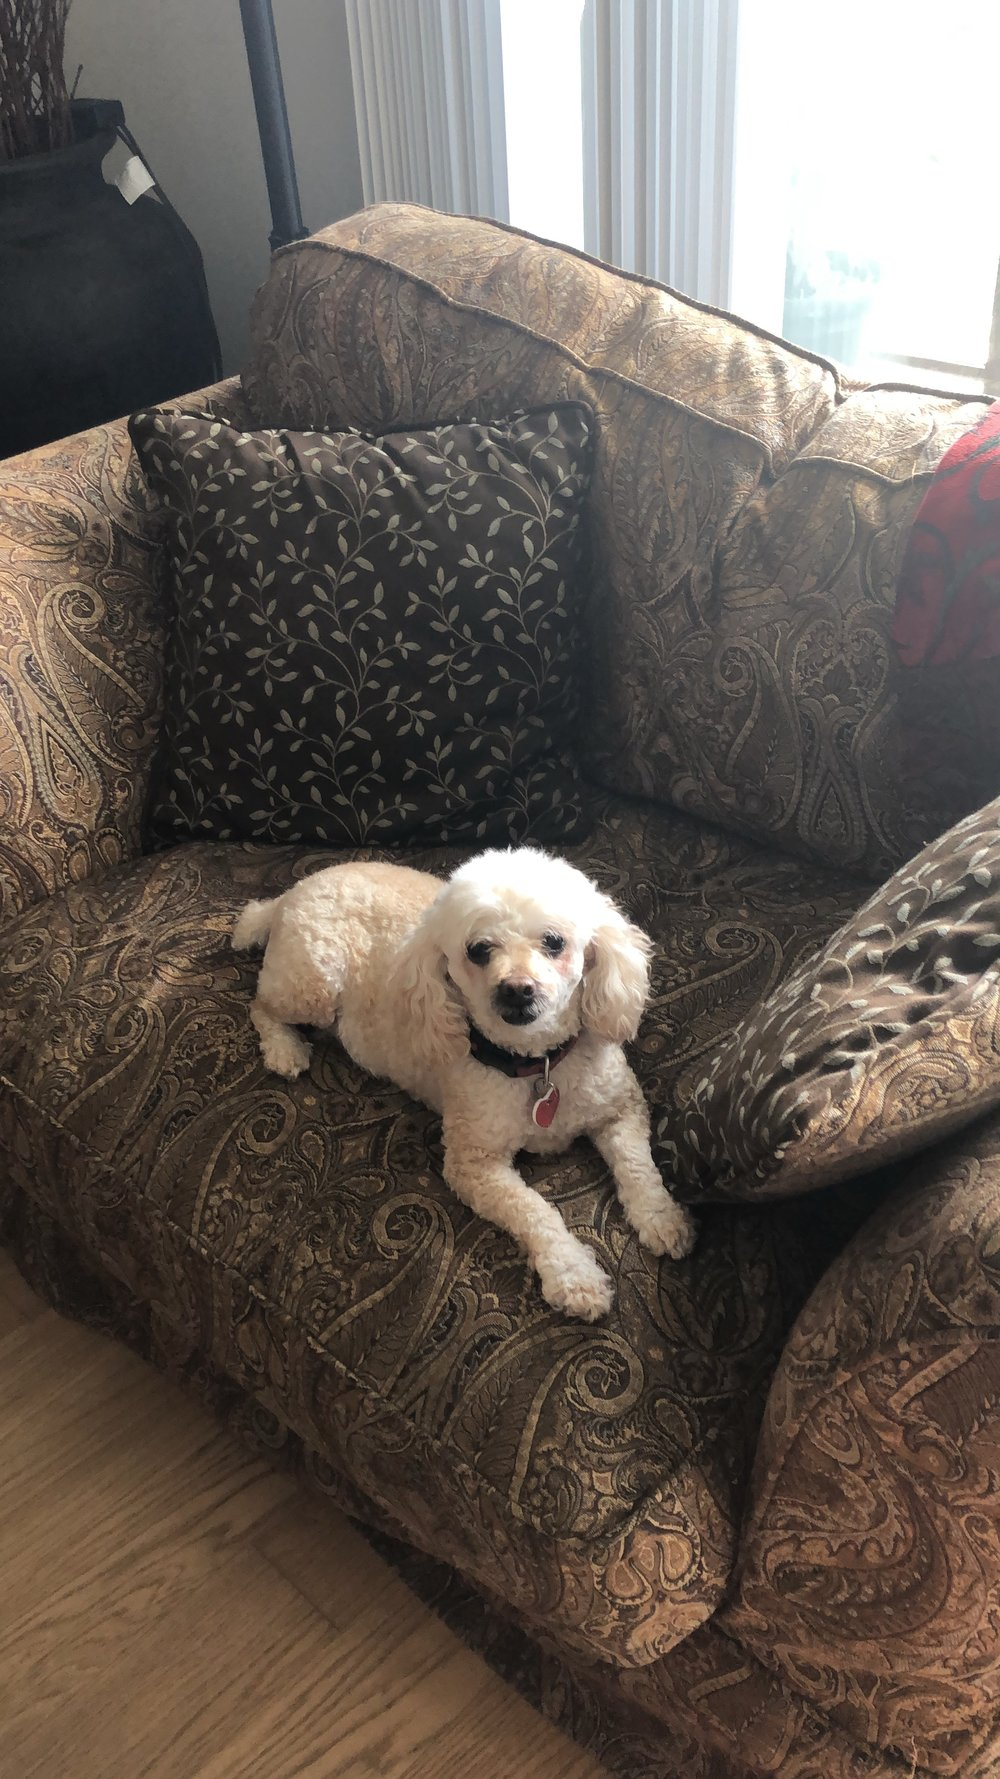 My poodle, Cayenne.